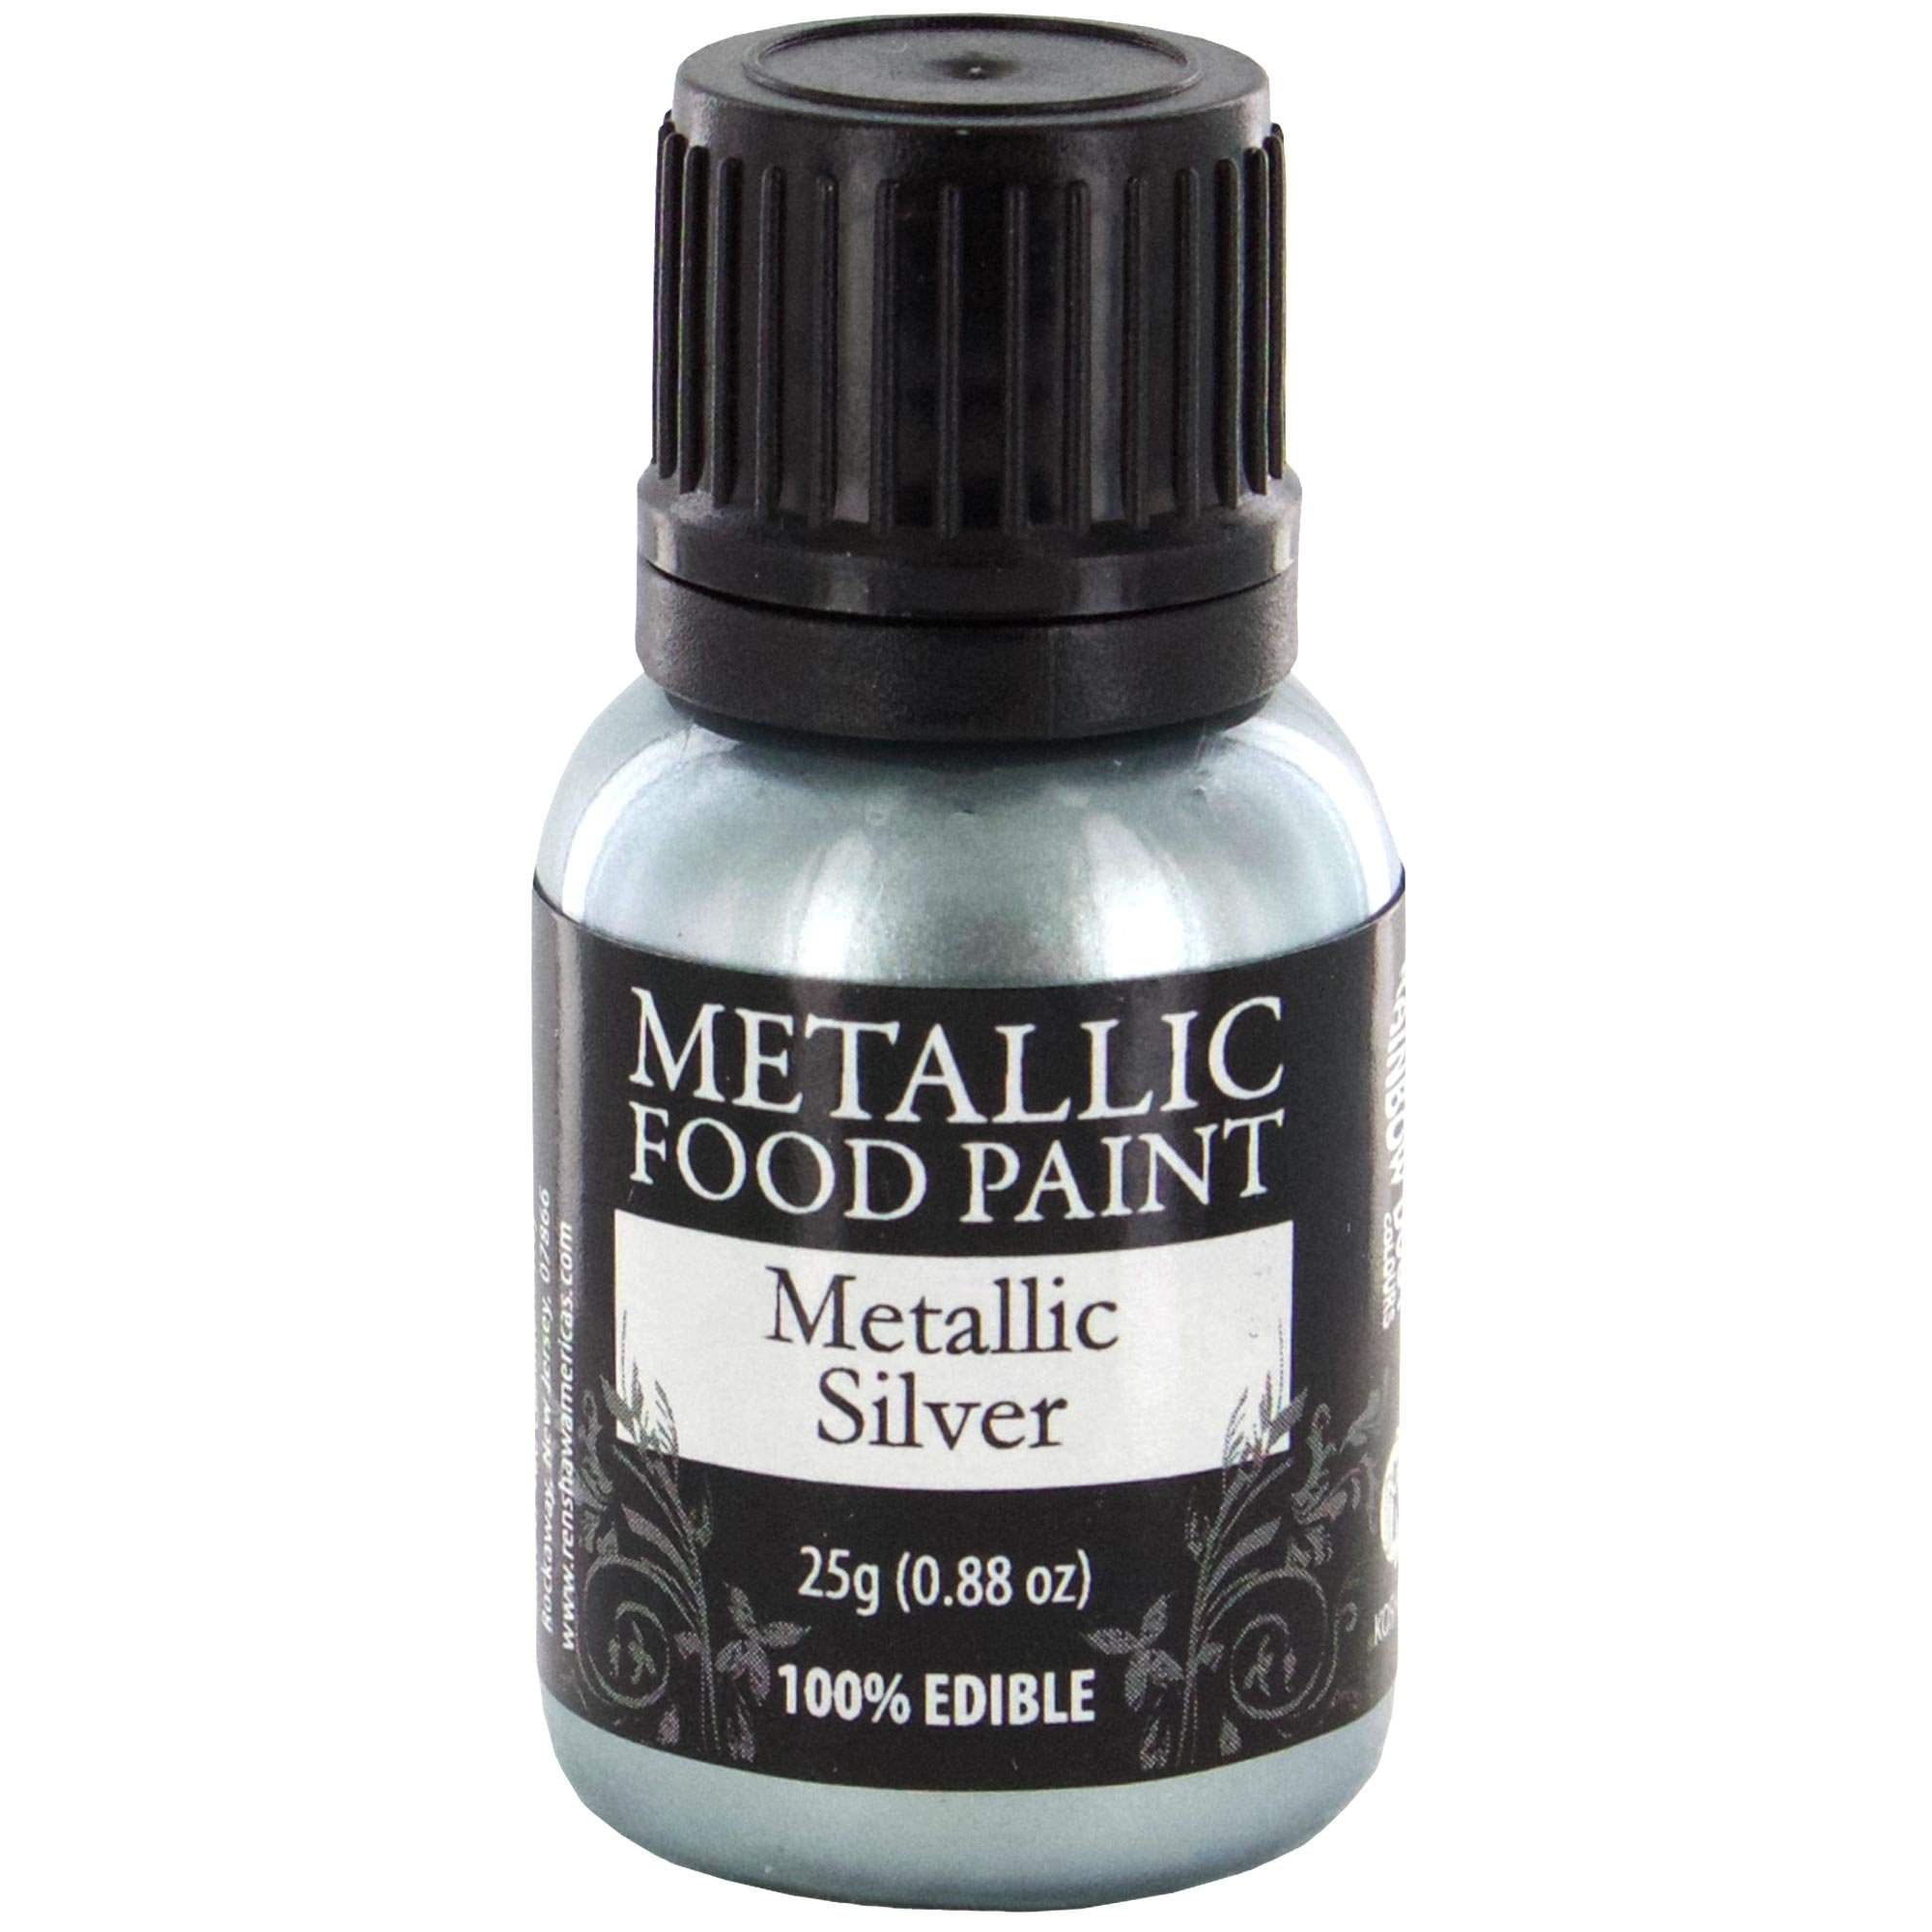 Renshaw Rainbow Dust Metallic Silver Food Paint, 0.88 oz